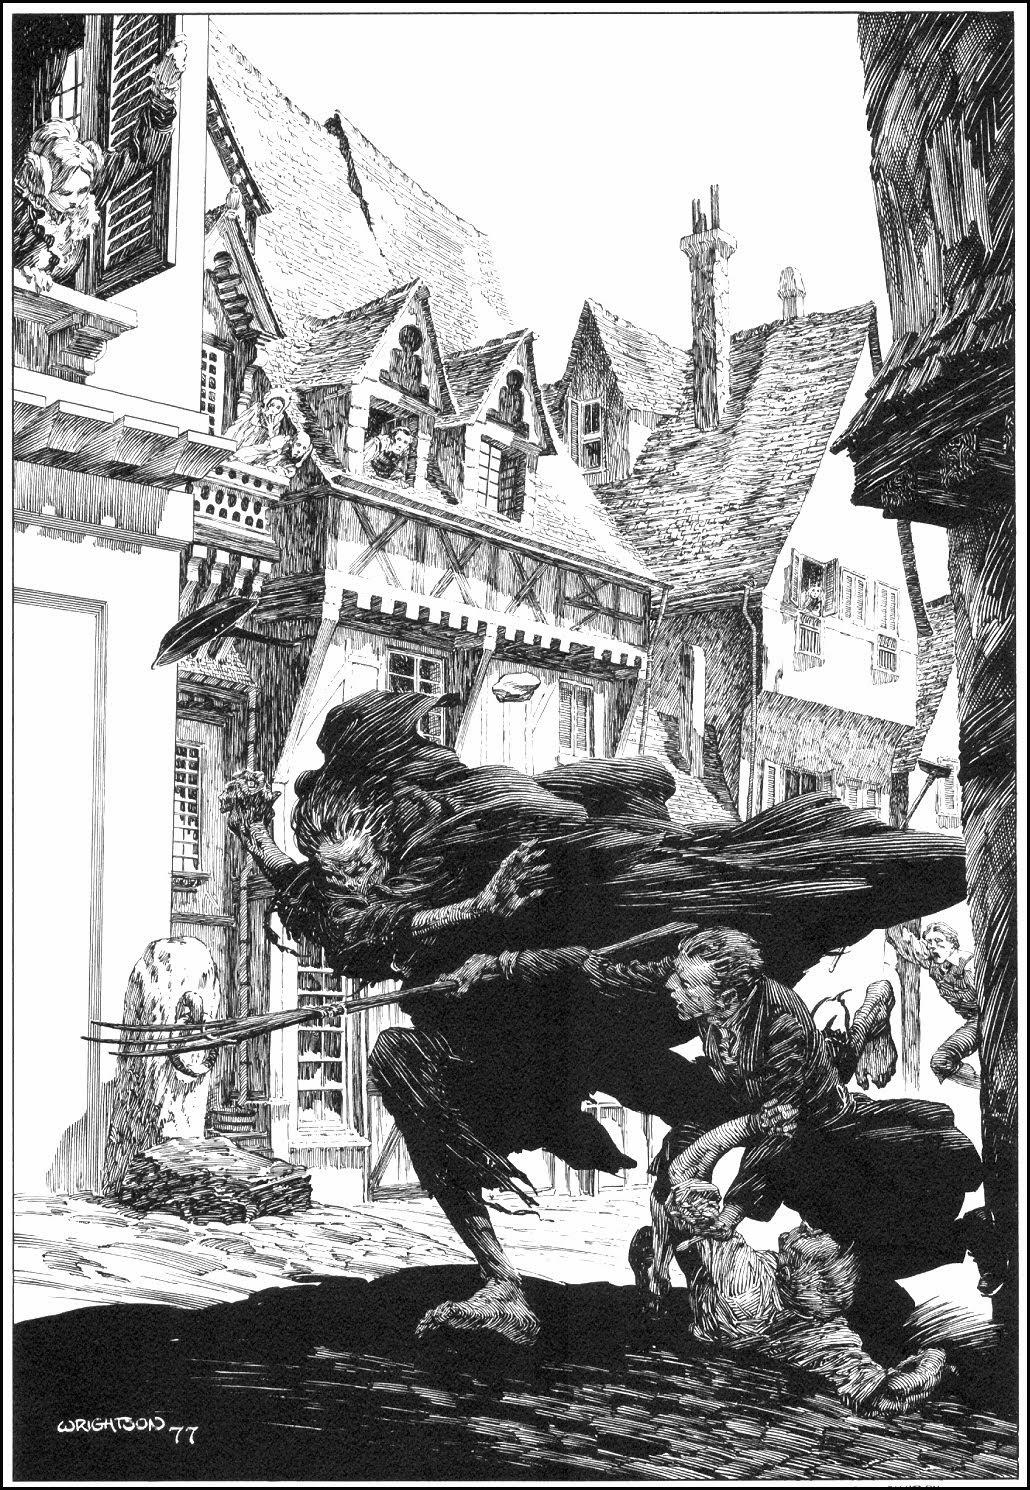 Heres The Legendary Bernie Wrightsons Illustrations For Mary Wollstonecraft Shelleys Frankenstein A Portfolio